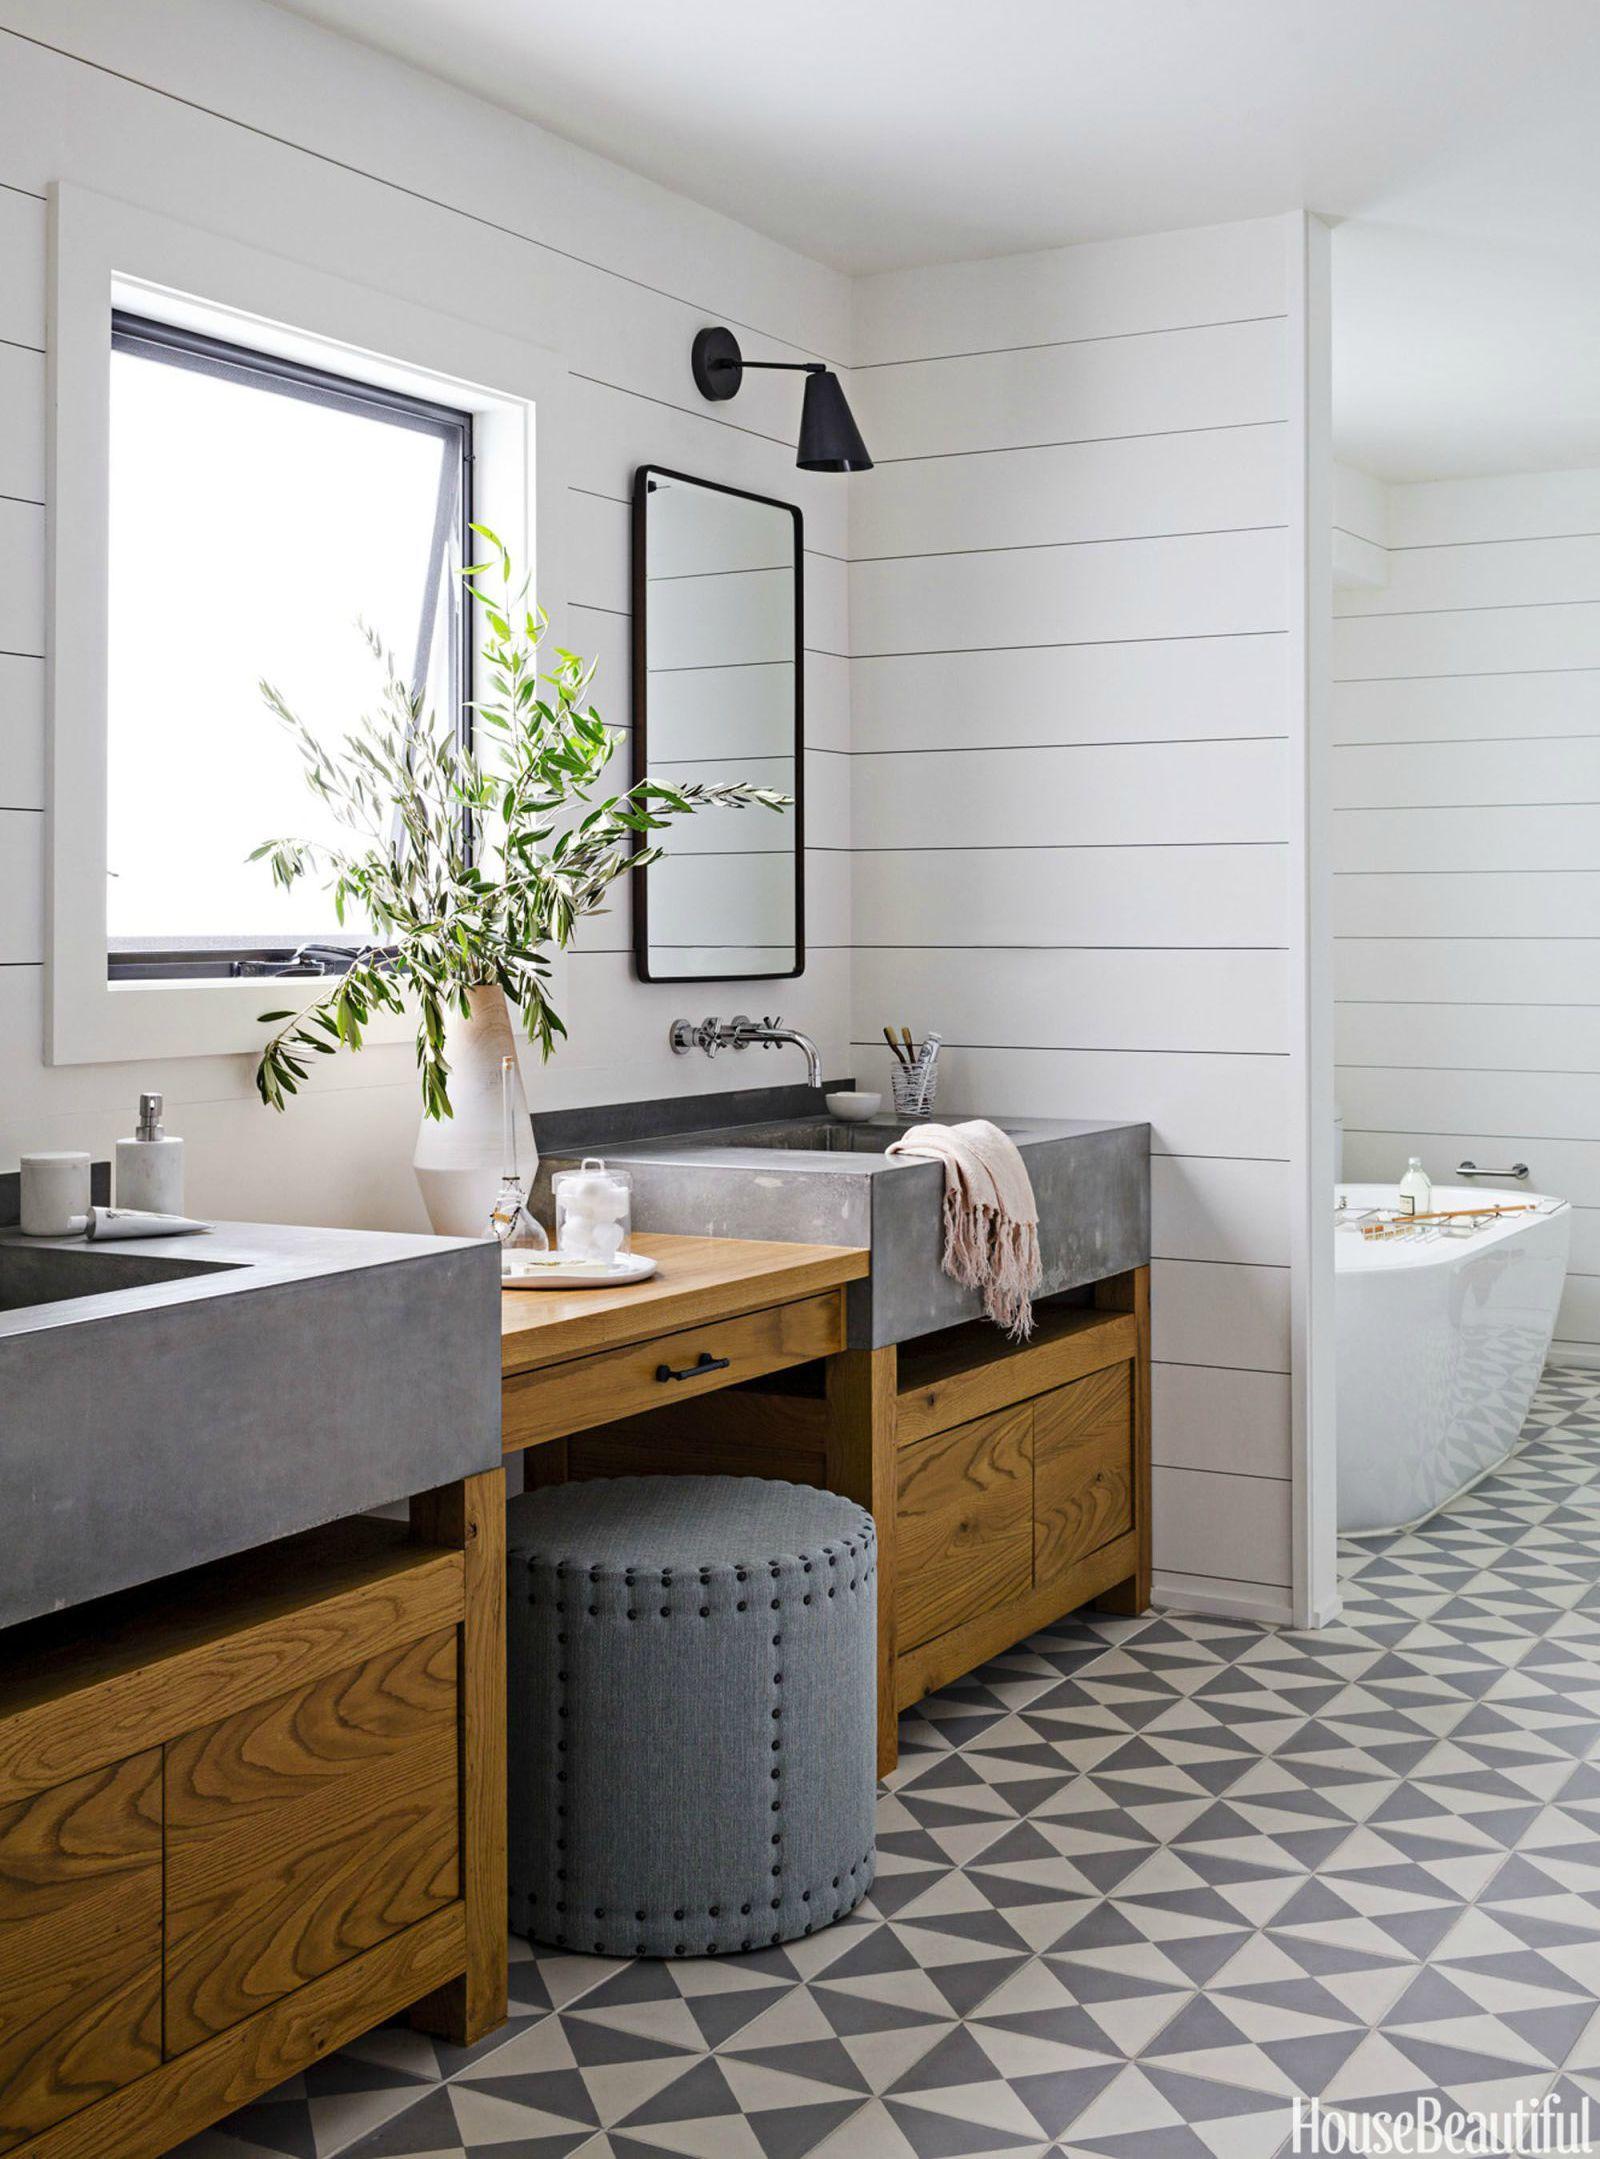 shiplap bathroom & 30+ Bathroom Tile Design Ideas - Tile Backsplash and Floor Designs ...